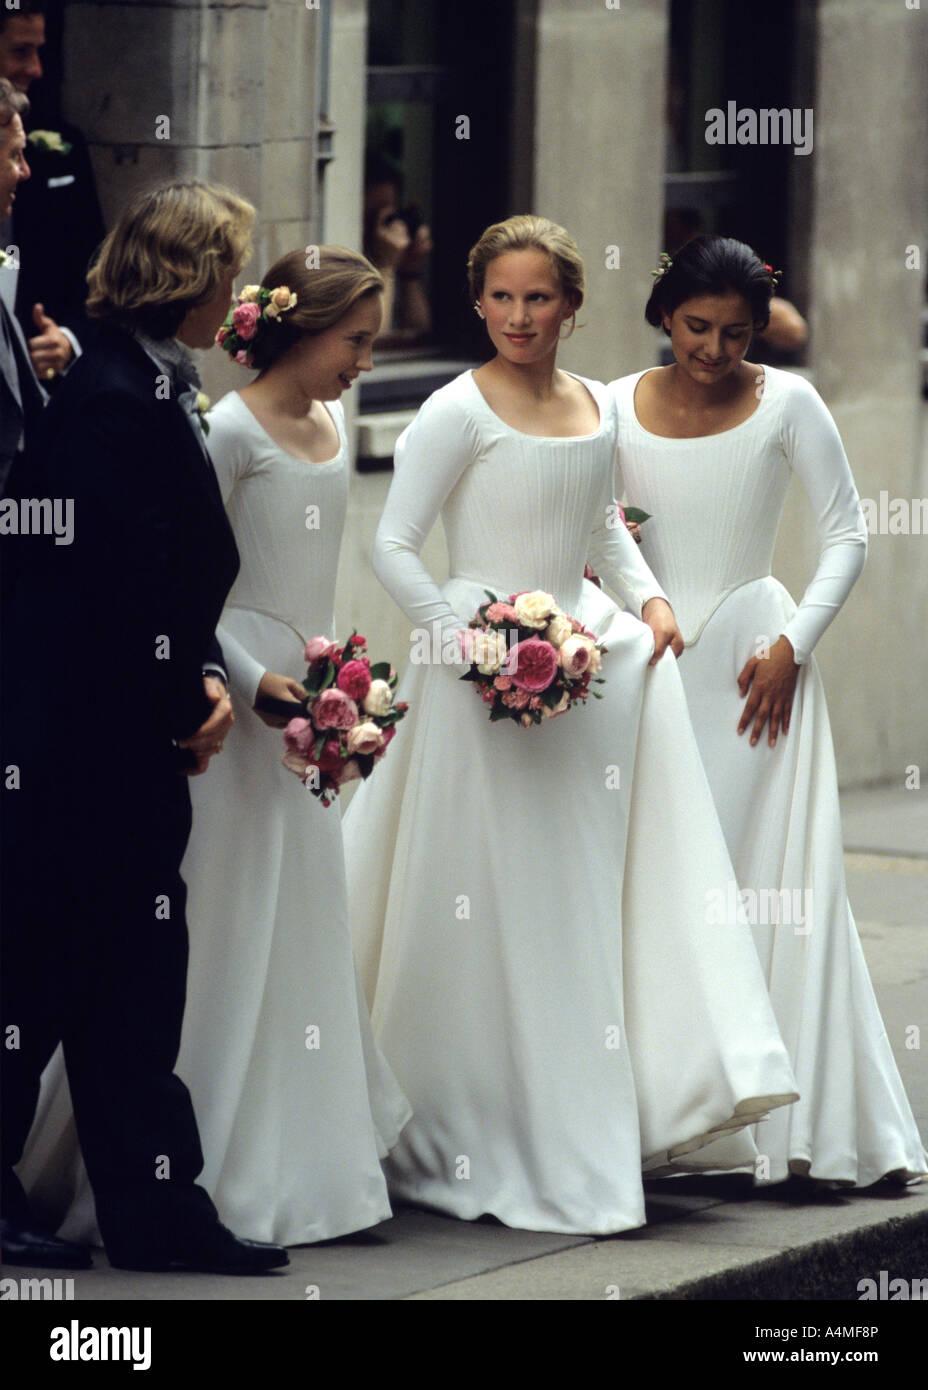 Zara Philips Wedding Dress Fashion Dresses,Formal Summer Beach Wedding Guest Dresses